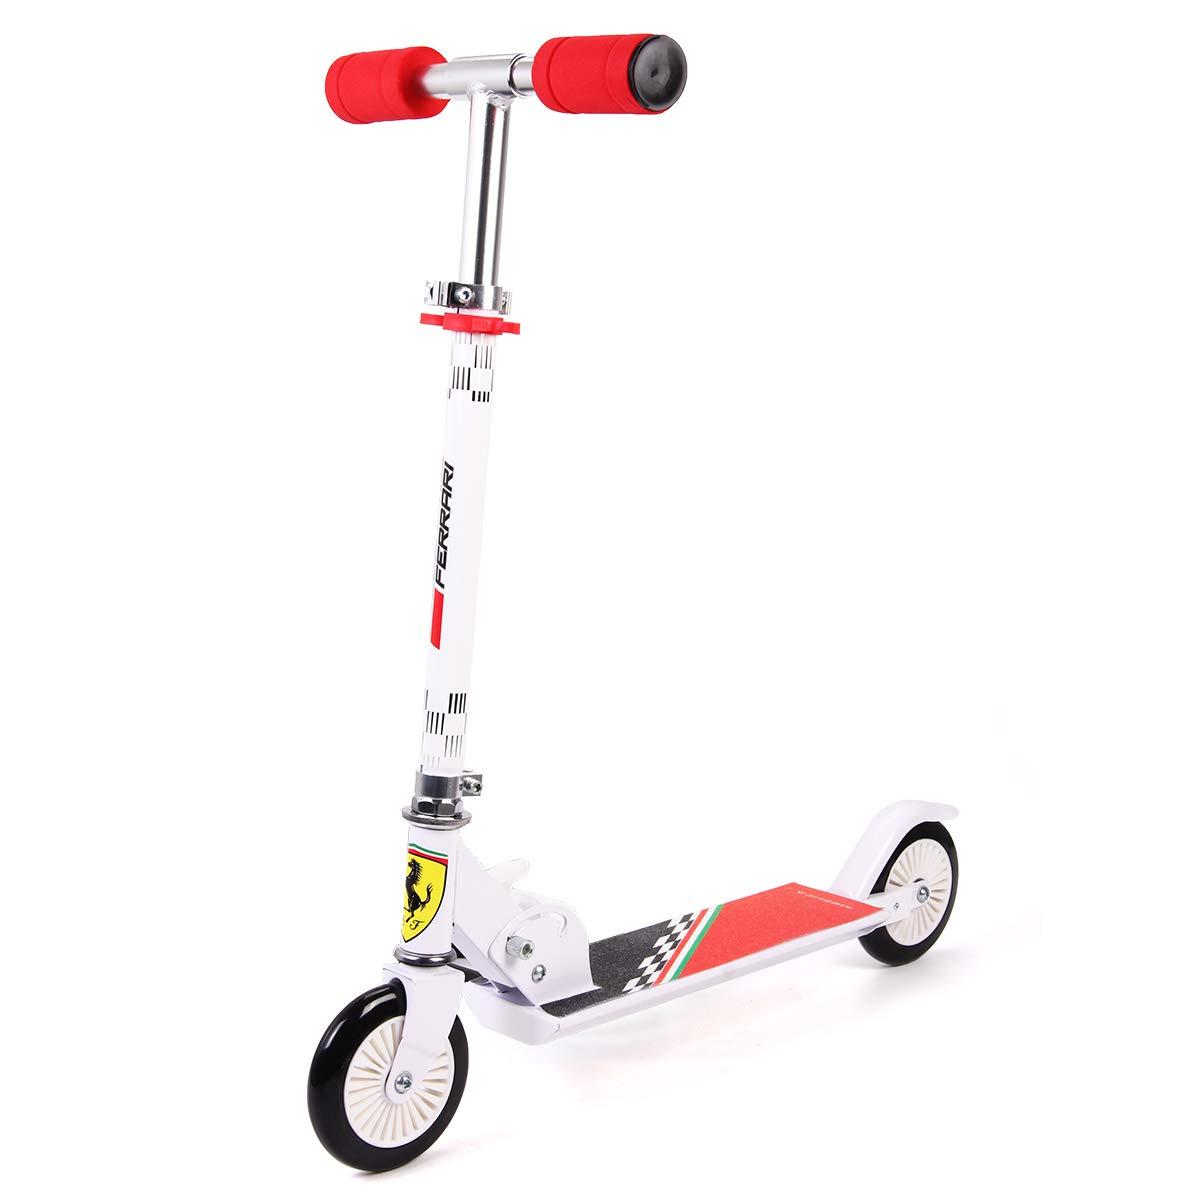 75a8eb49df1 Amazon.com : Ferrari Kids Scooter 2 Wheels Kick Push Folding Aluminum Stunt  Height Adjustable Skate Board (Red) : Sports & Outdoors